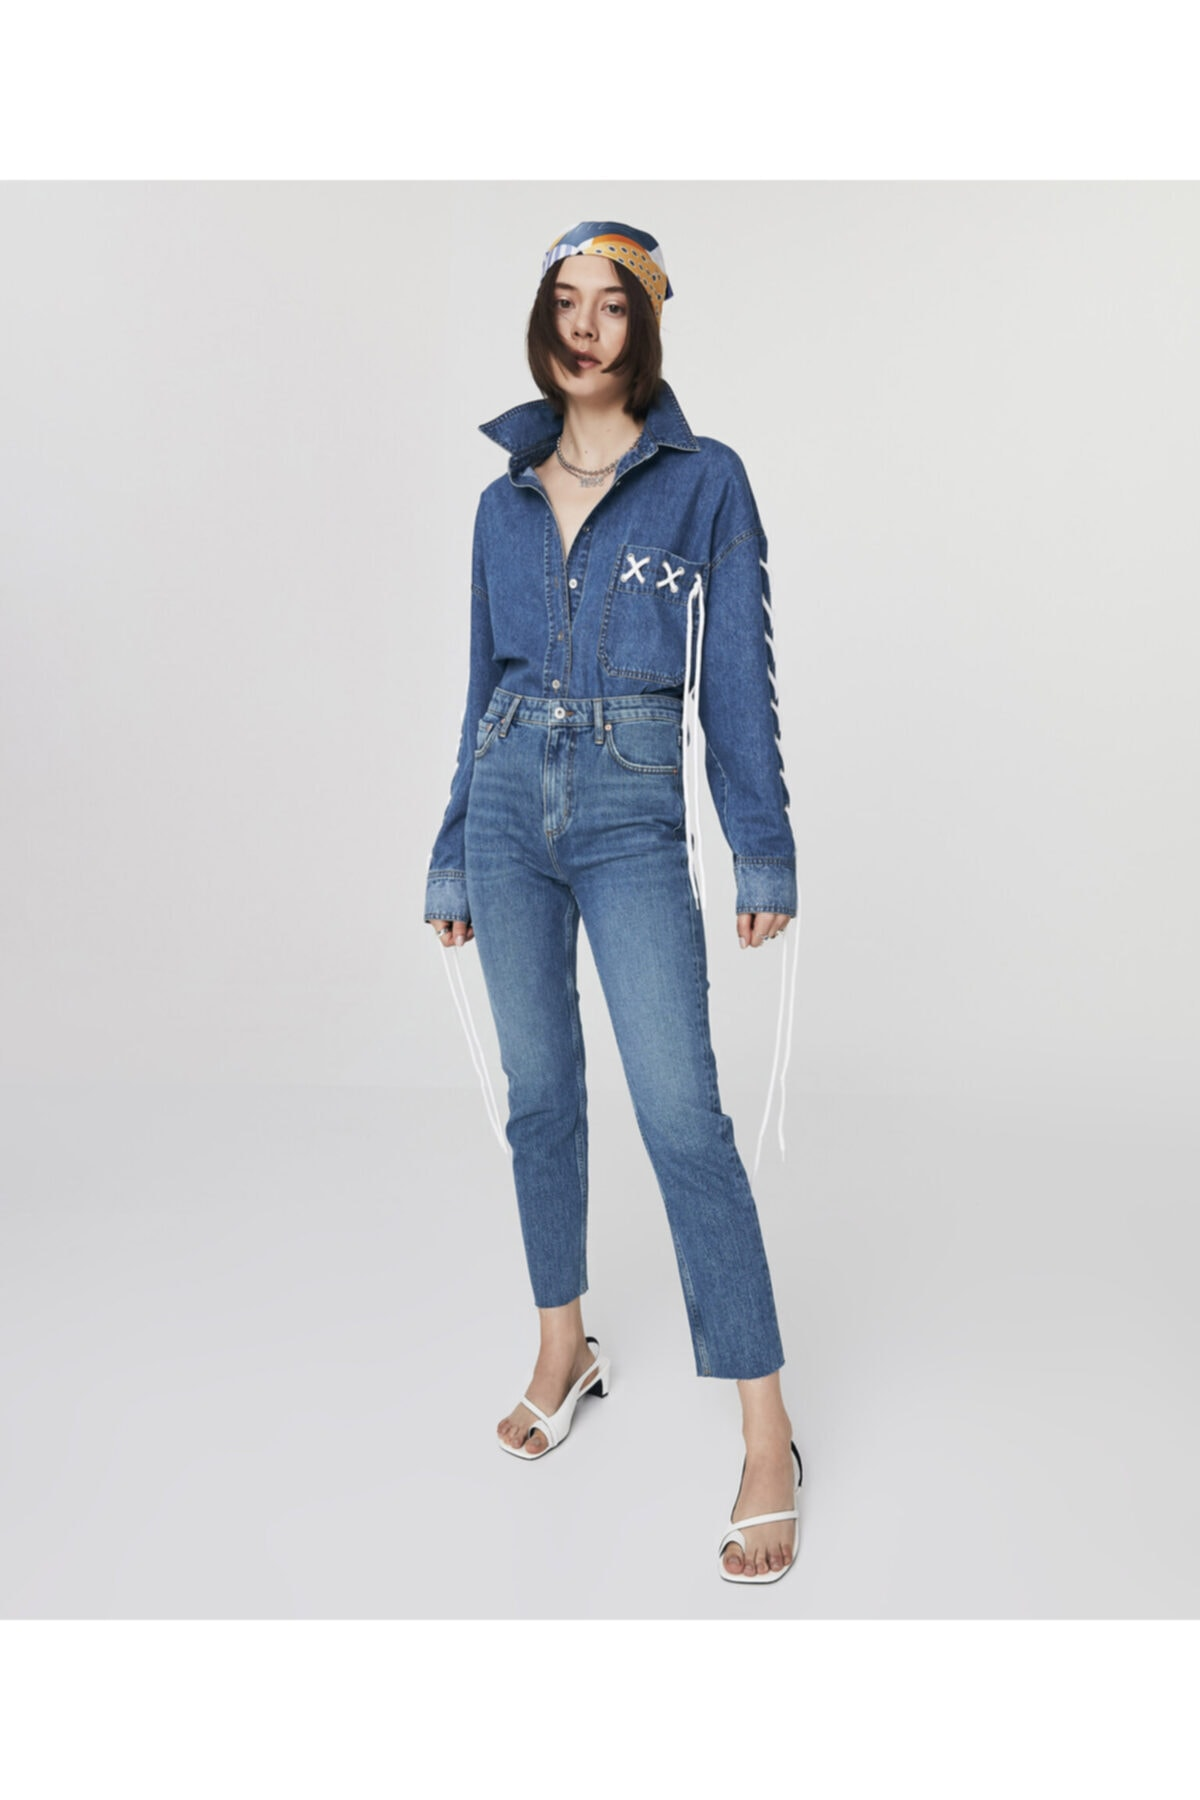 Twist Kadın Mavi High Rise Ankle Length Jean Pantolon TS1210018034 2